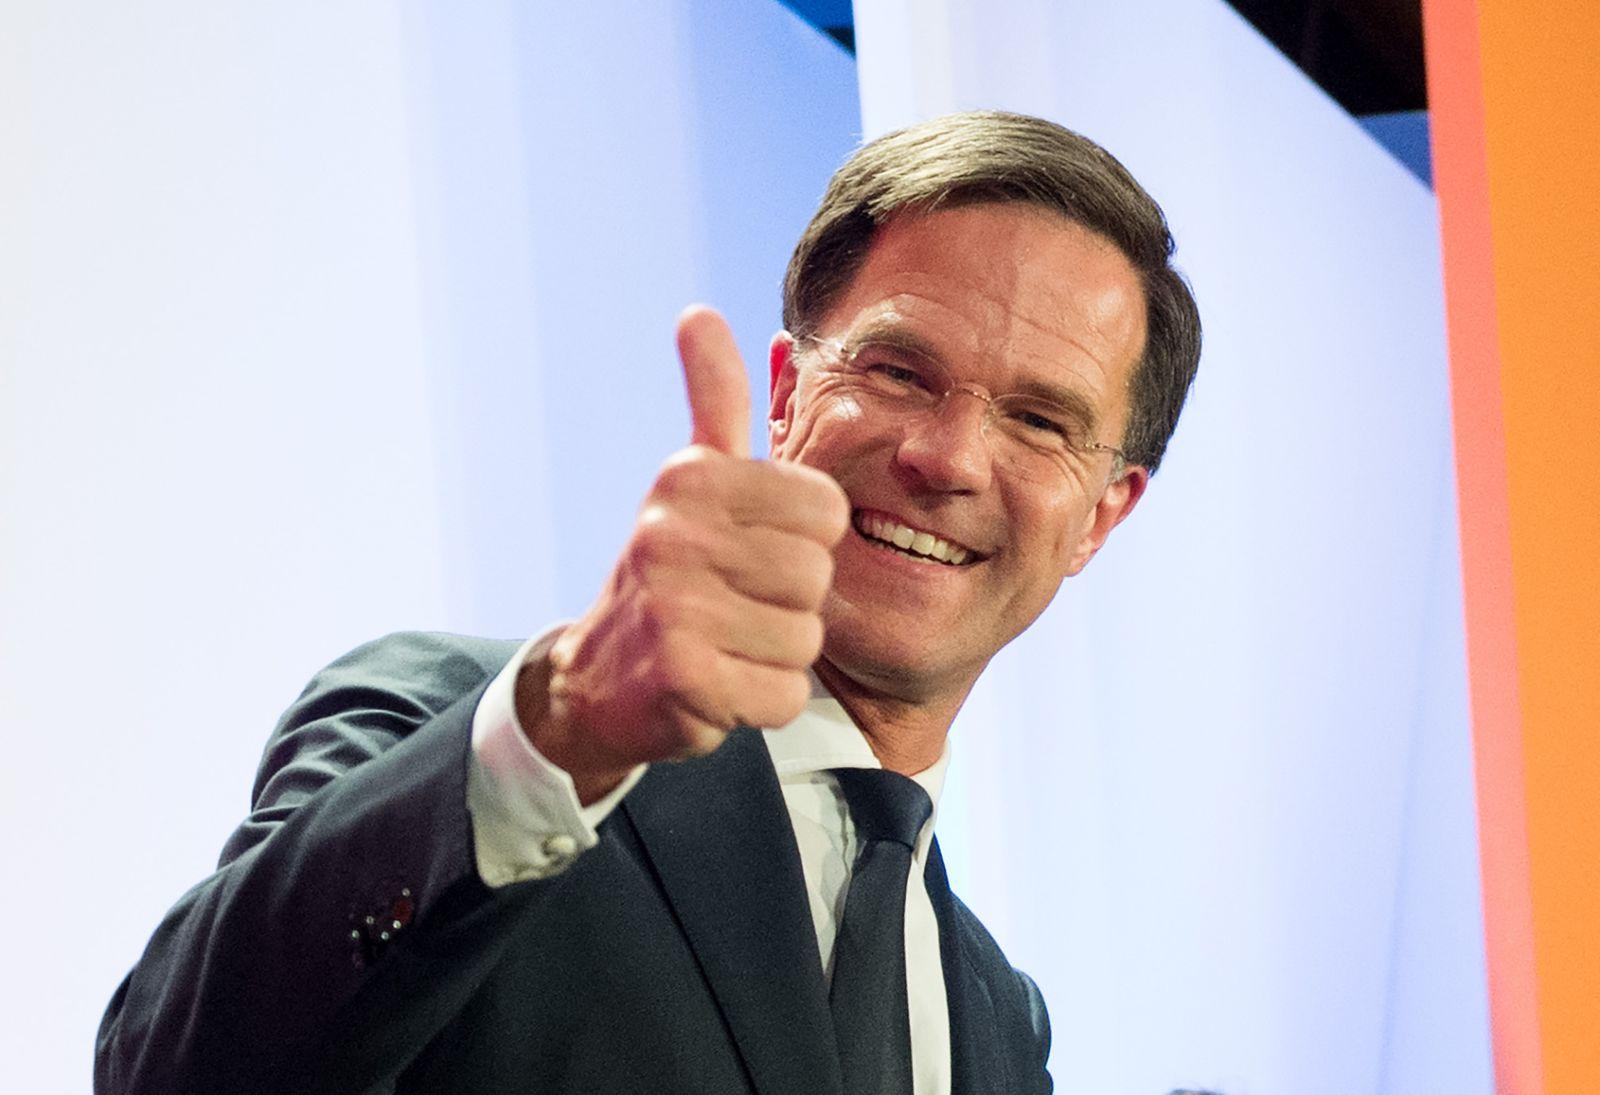 Wahlen in den Niederlanden